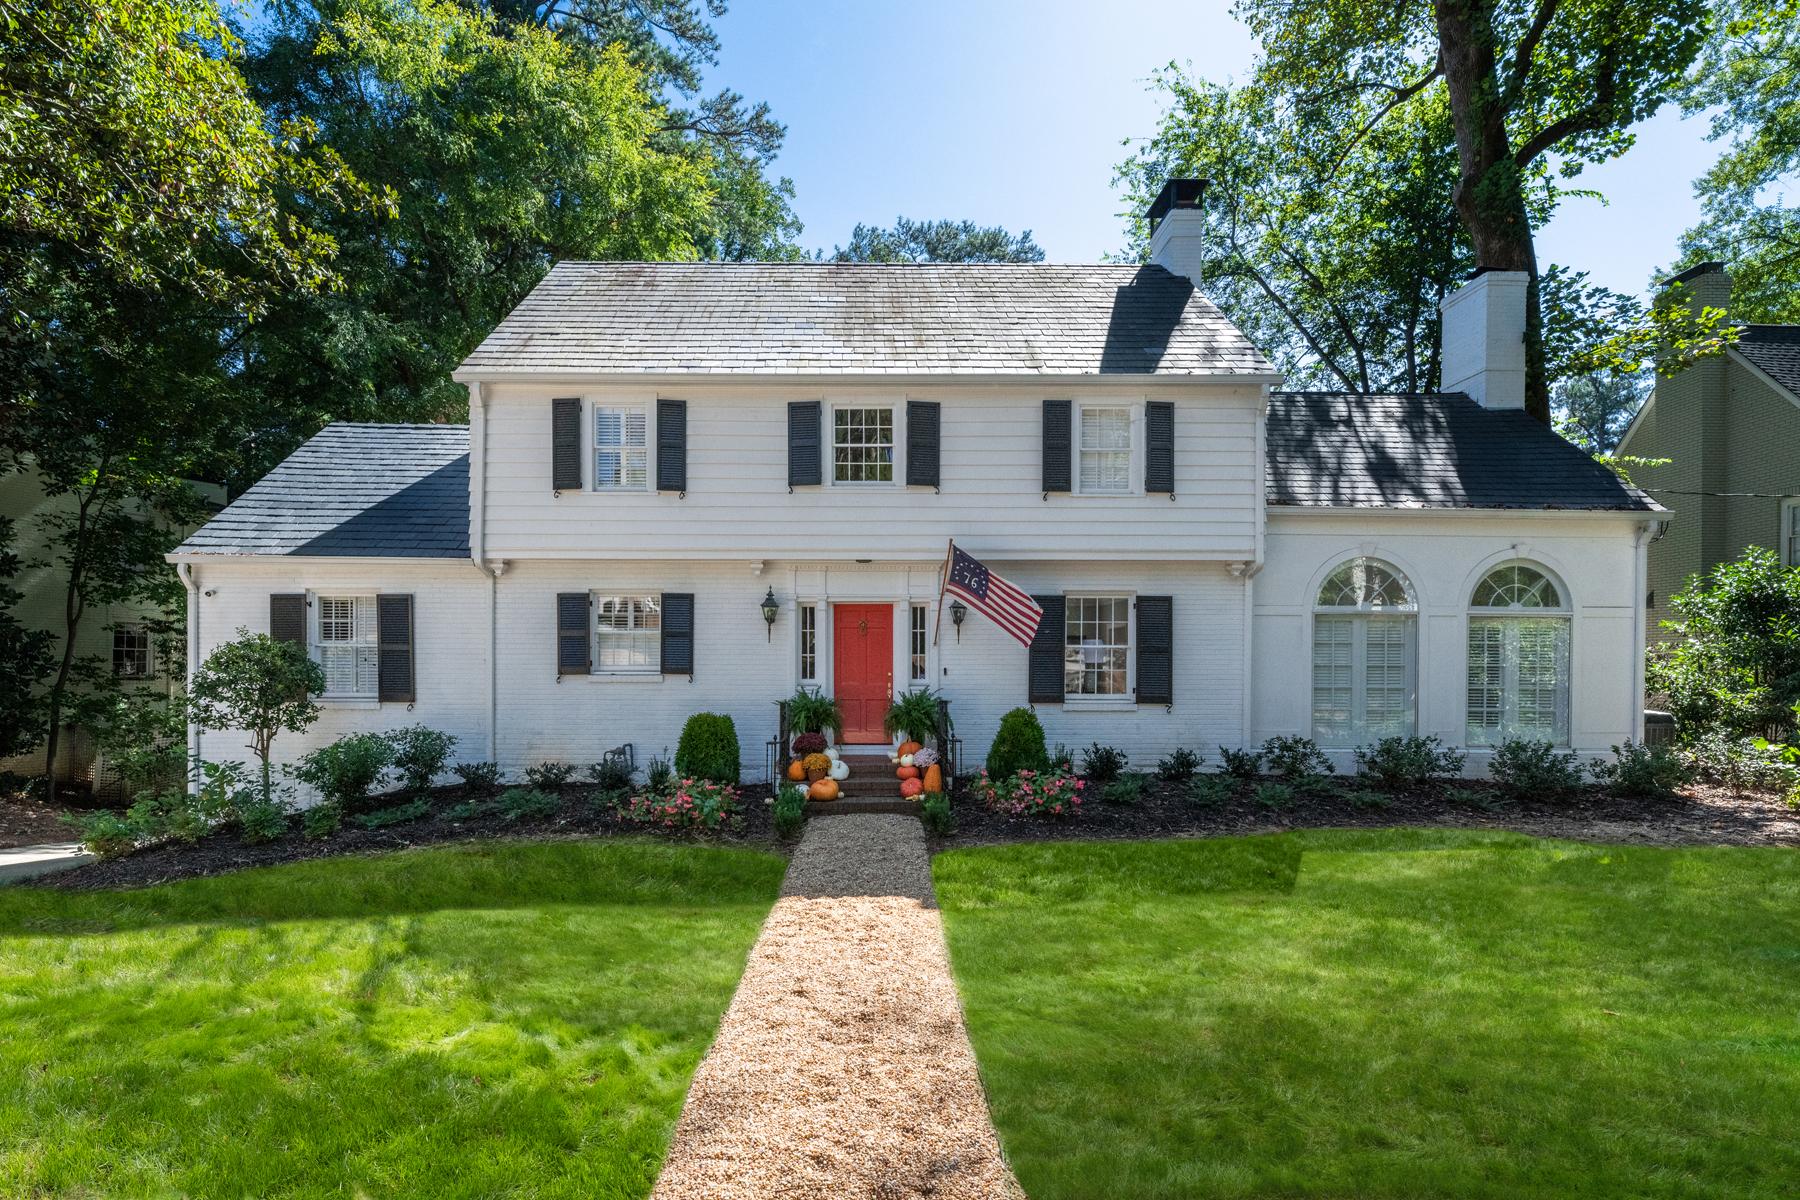 Single Family Homes для того Продажа на Charming House on Incredible Large Lot in Sought After Tuxedo Park 3355 Habersham Rd, Atlanta, Джорджия 30305 Соединенные Штаты